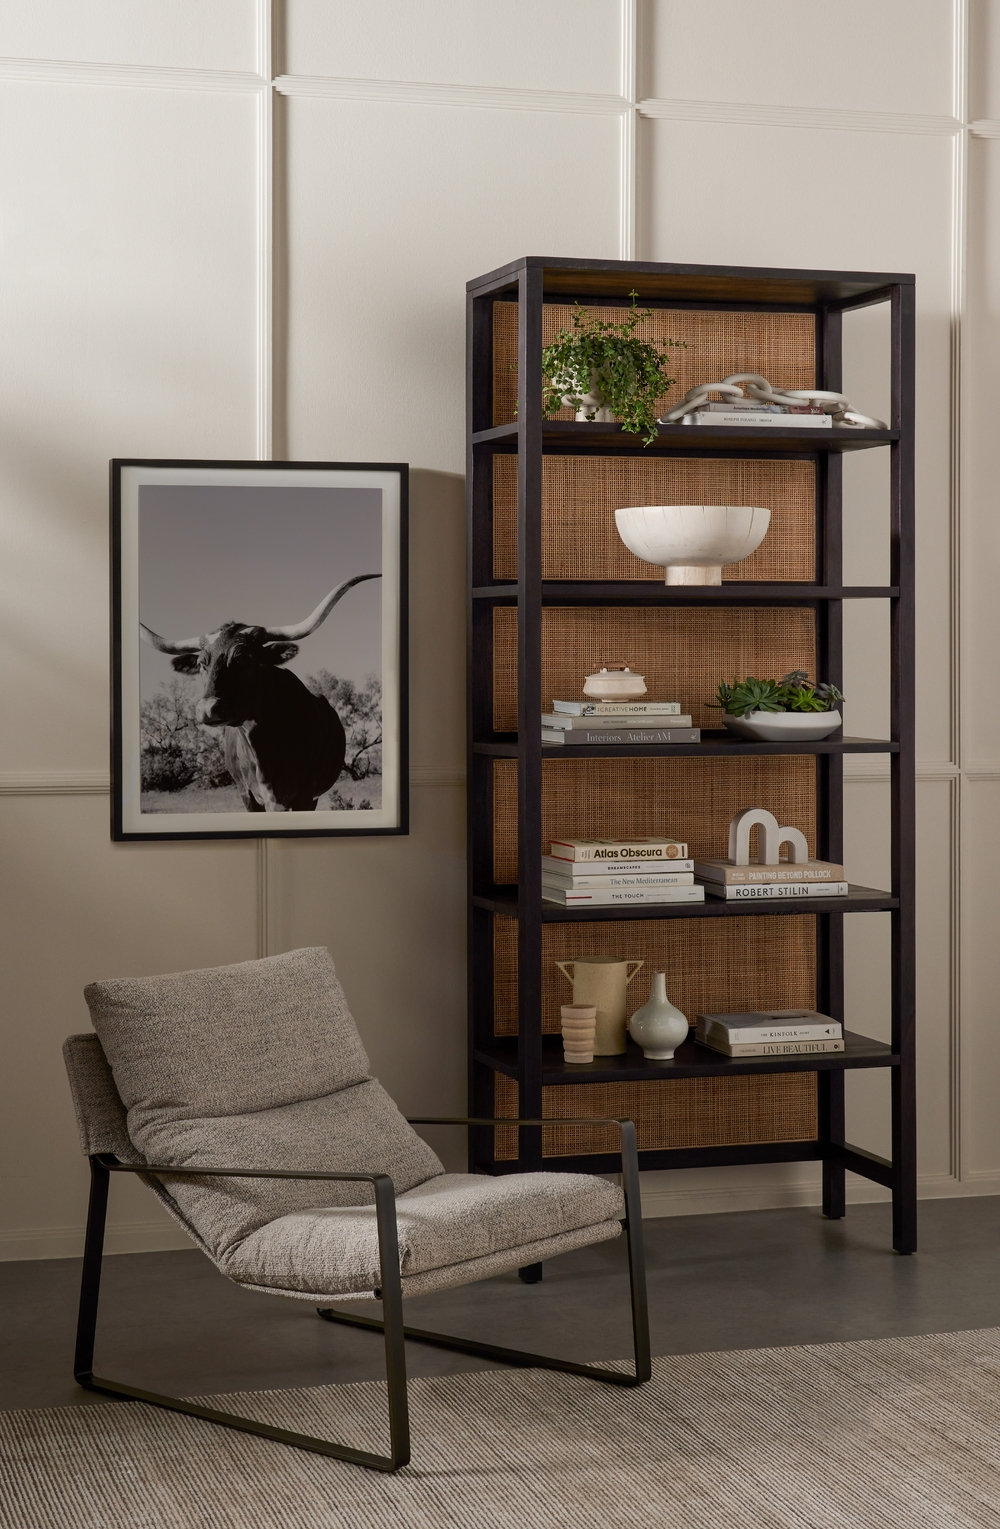 Four Hands - Caprice Large Bookshelf